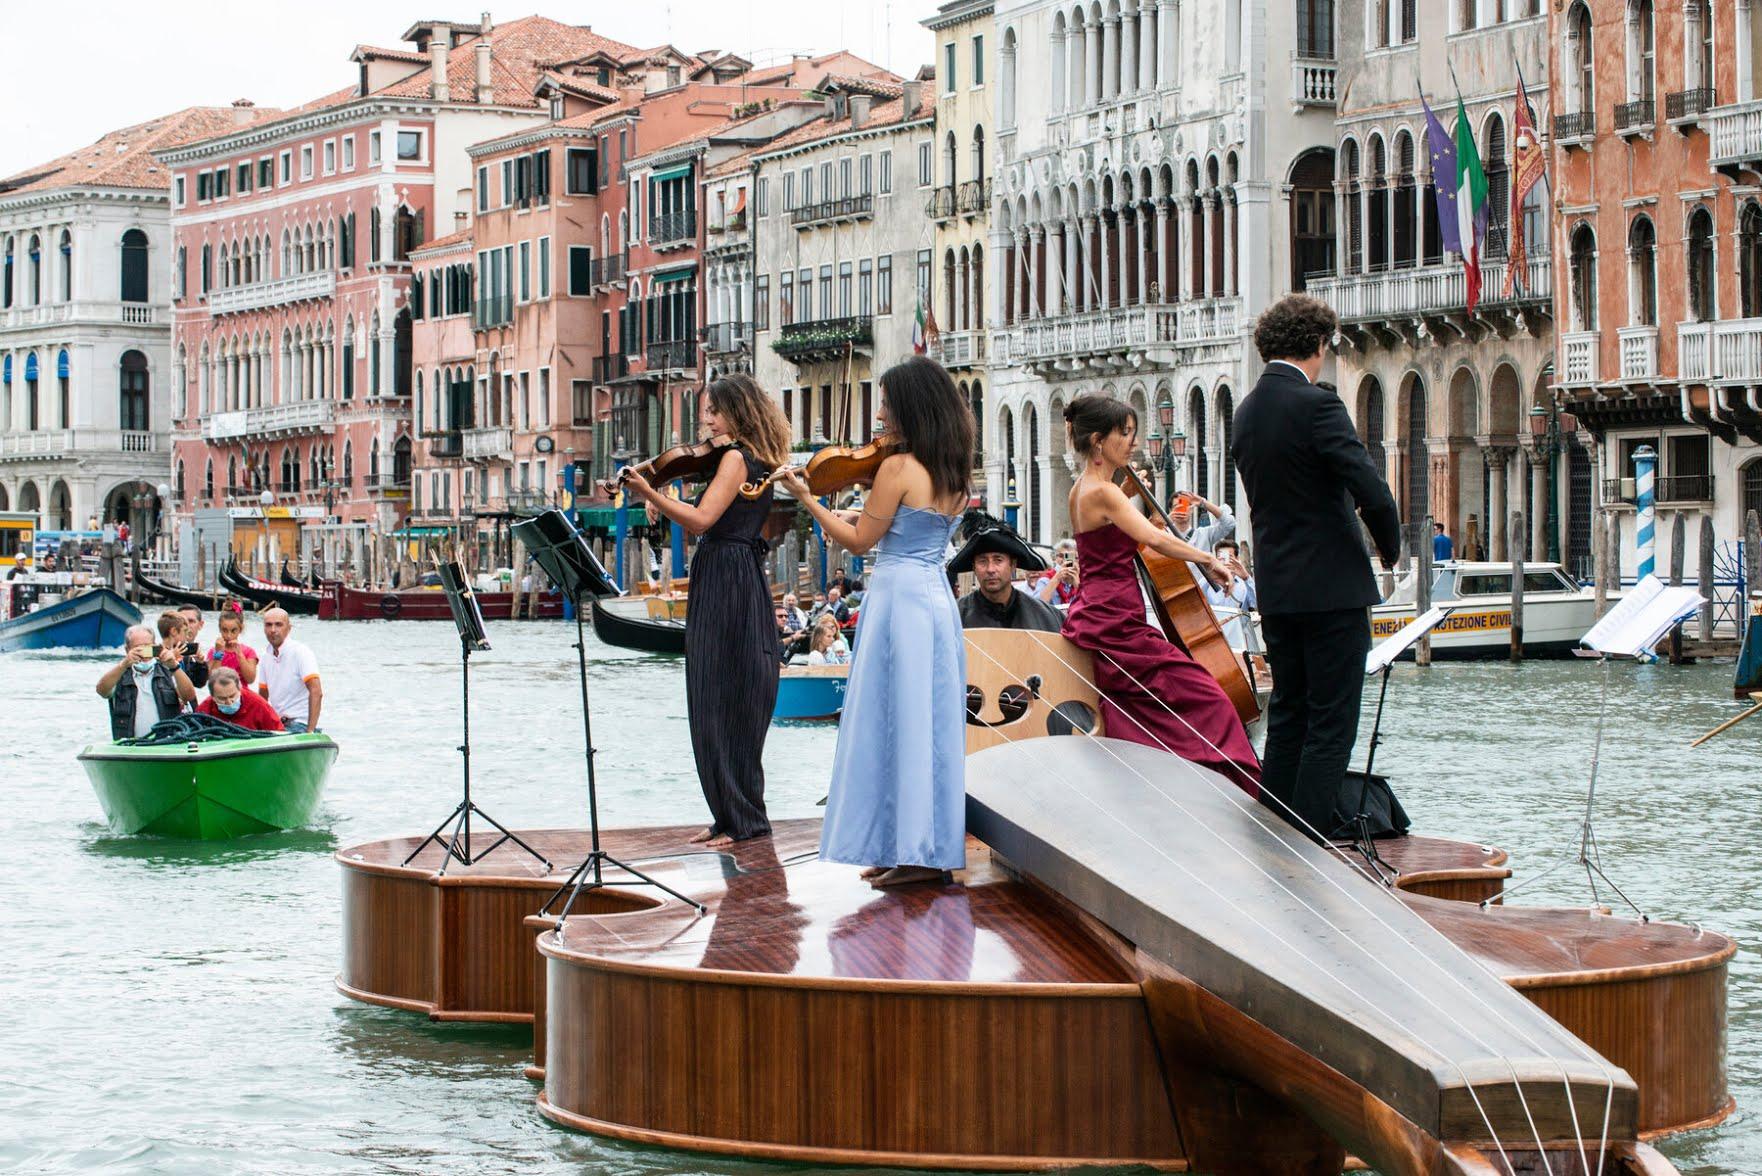 The musicians played barefoot for a better grip. From left,Caterina Camozzi,Angelica Faccani,Tiziana Gasparoni andSokol Prekalori.